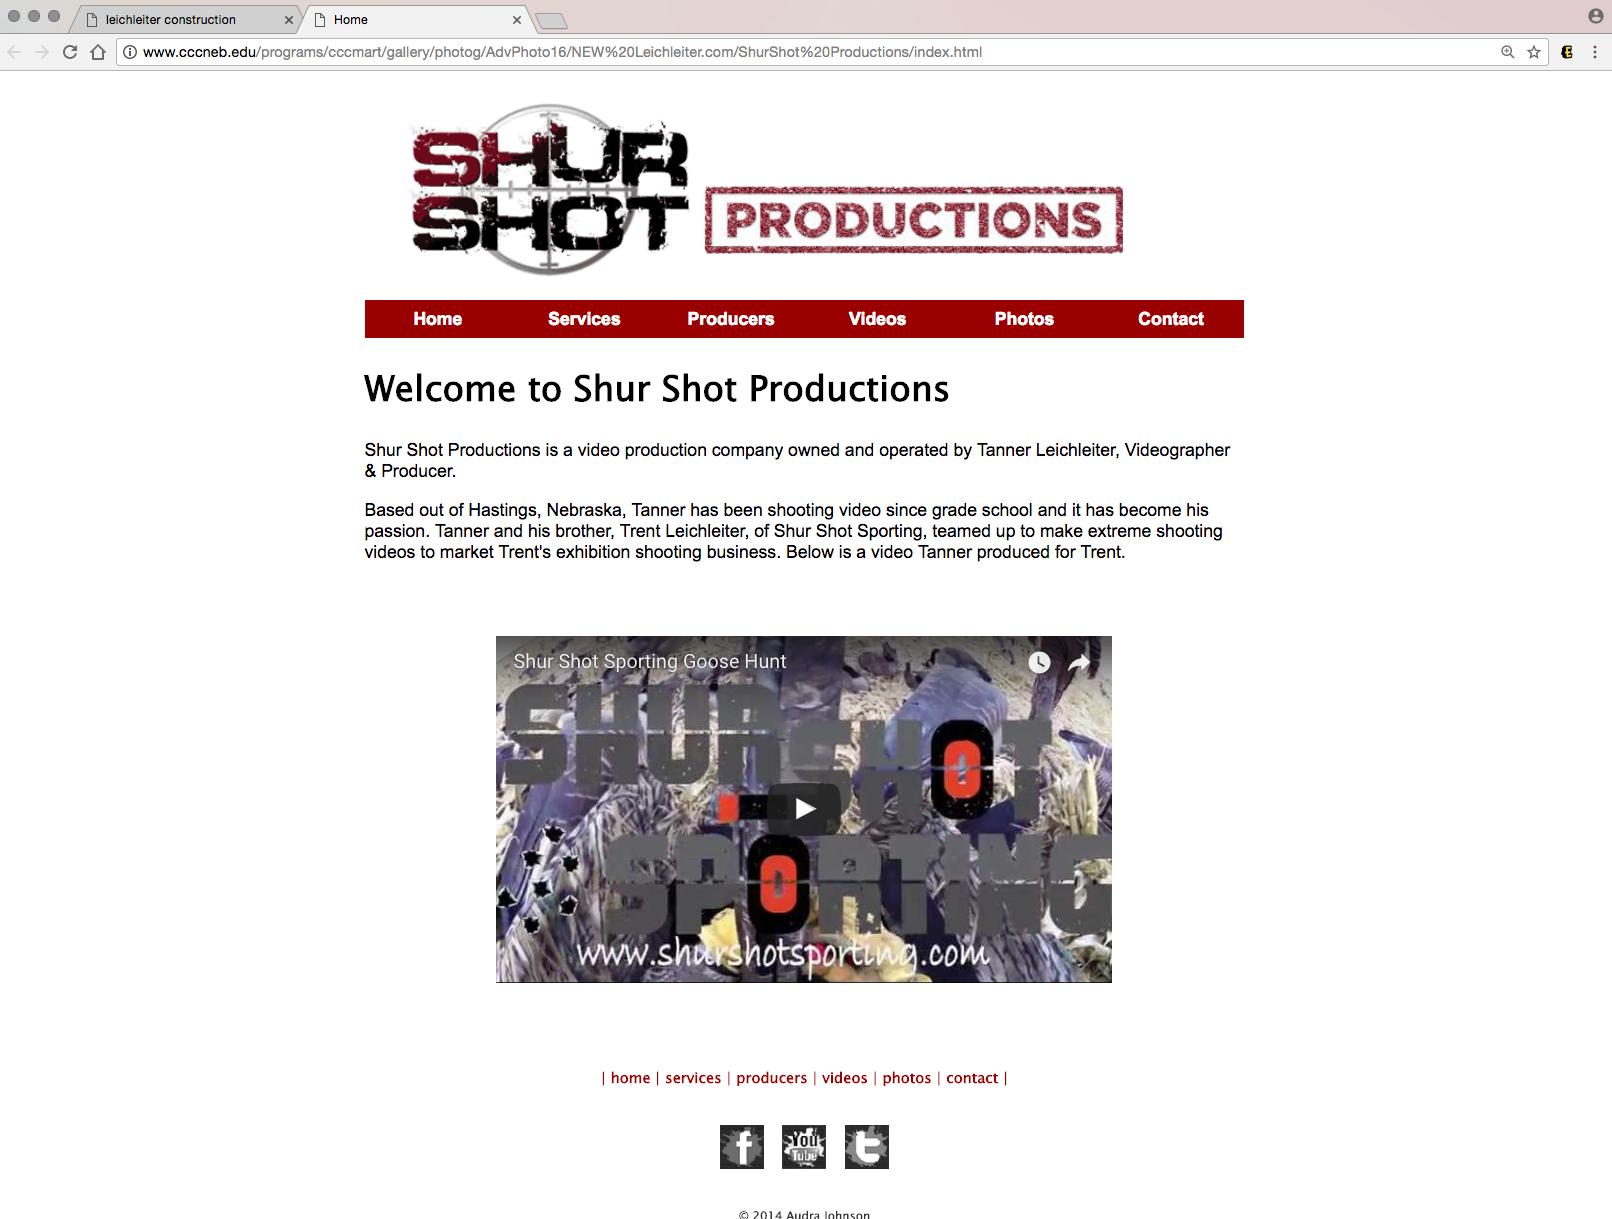 Shur Shot Productions